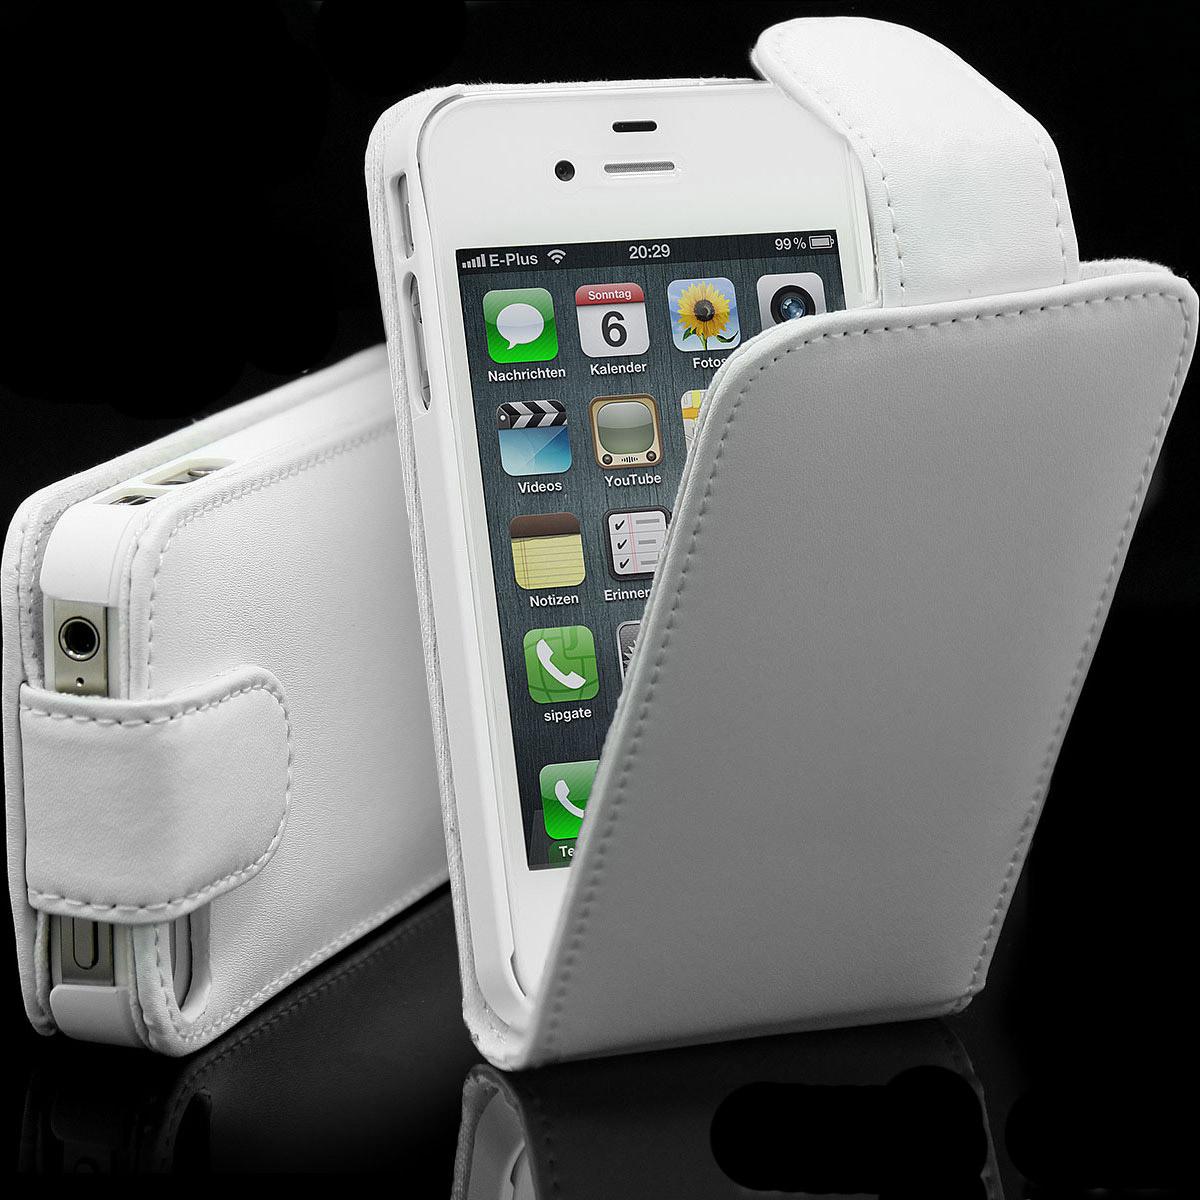 Fuer-Apple-iPhone-4-4S-4G-Flip-Tasche-Schutz-Huelle-Cover-Flip-Case-Original-weiss